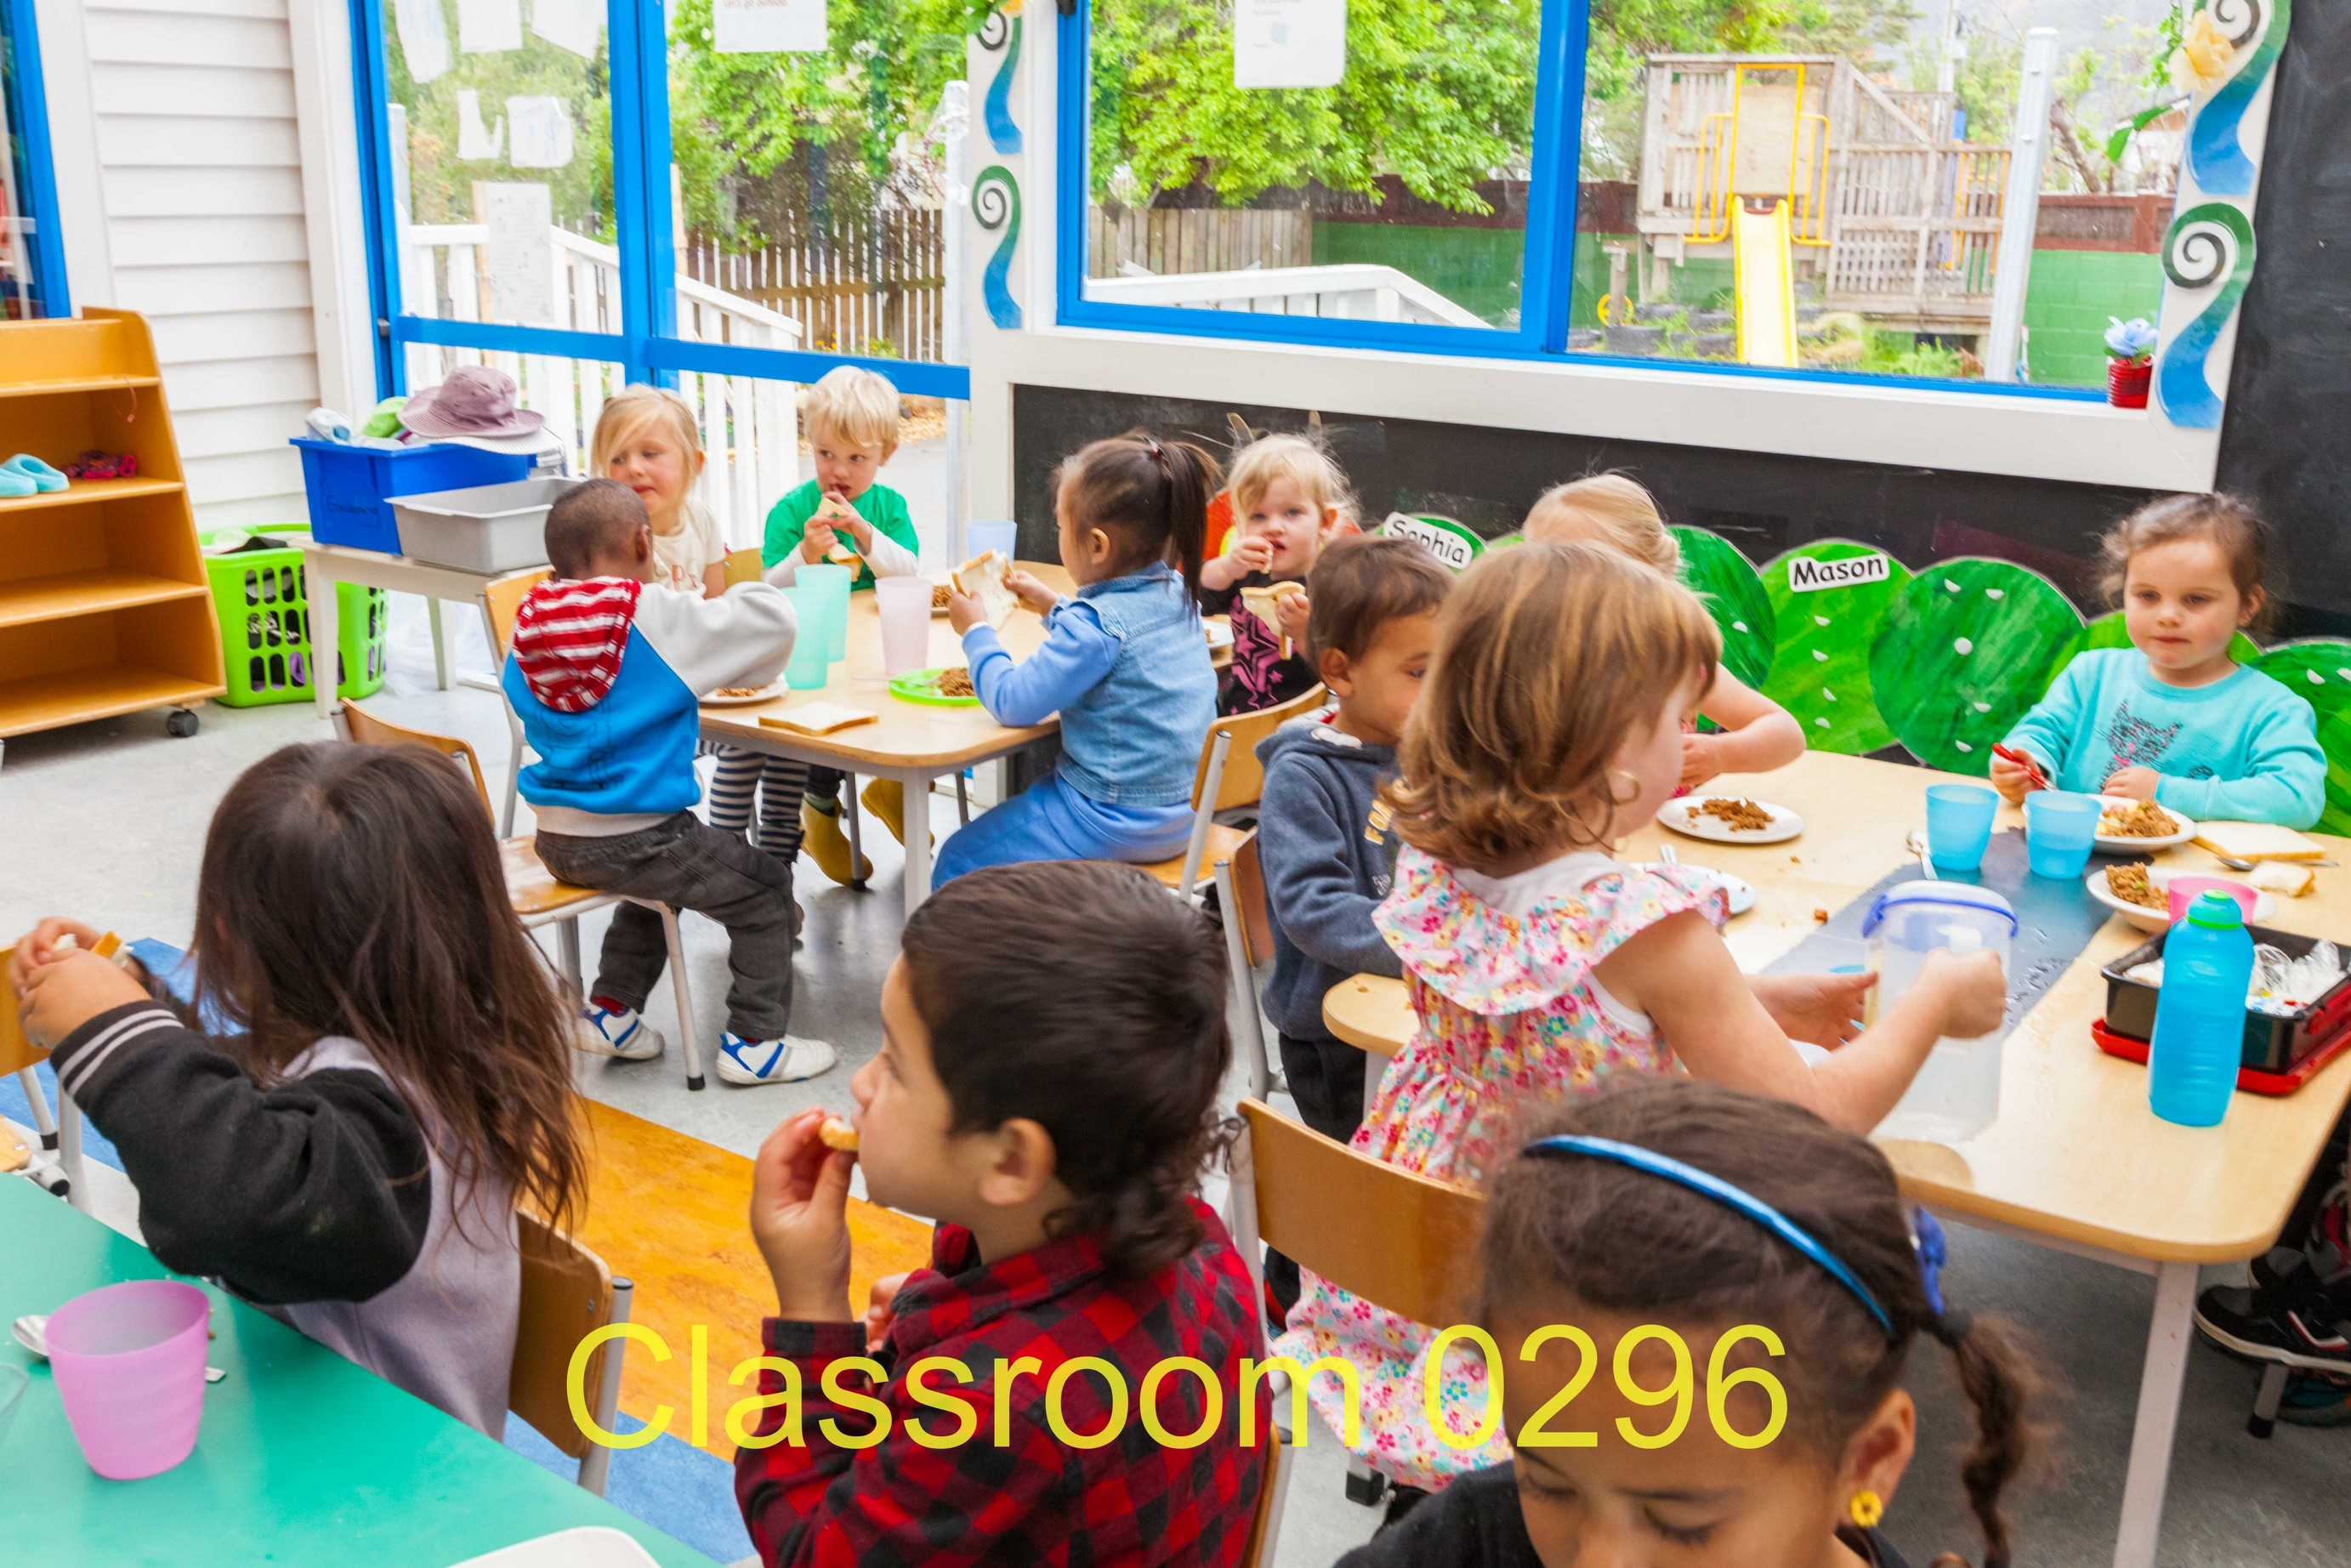 Classroom 0296